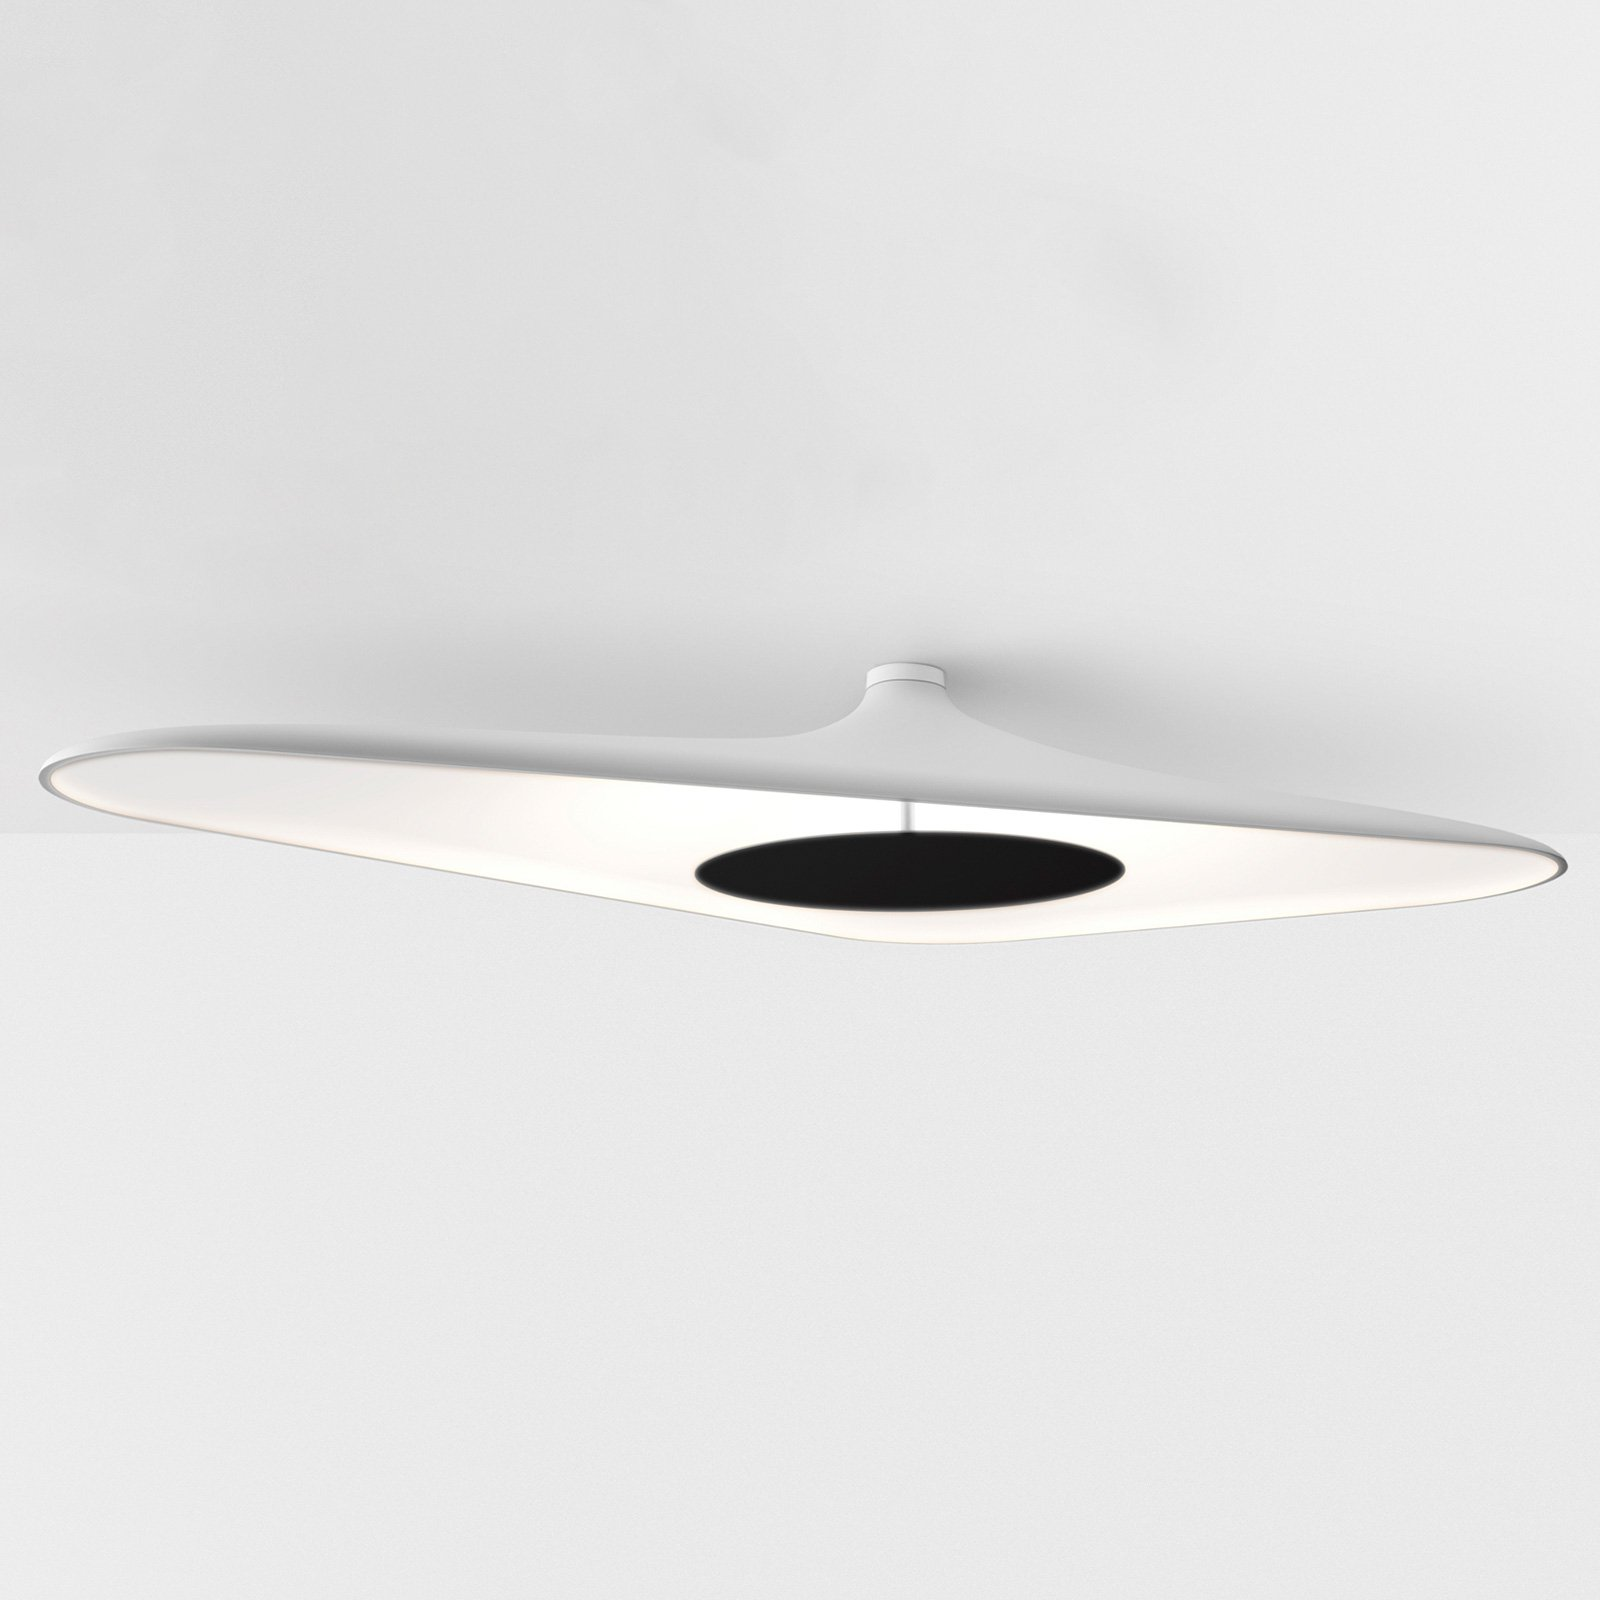 Luceplan Soleil Noir - LED-taklampe, hvit